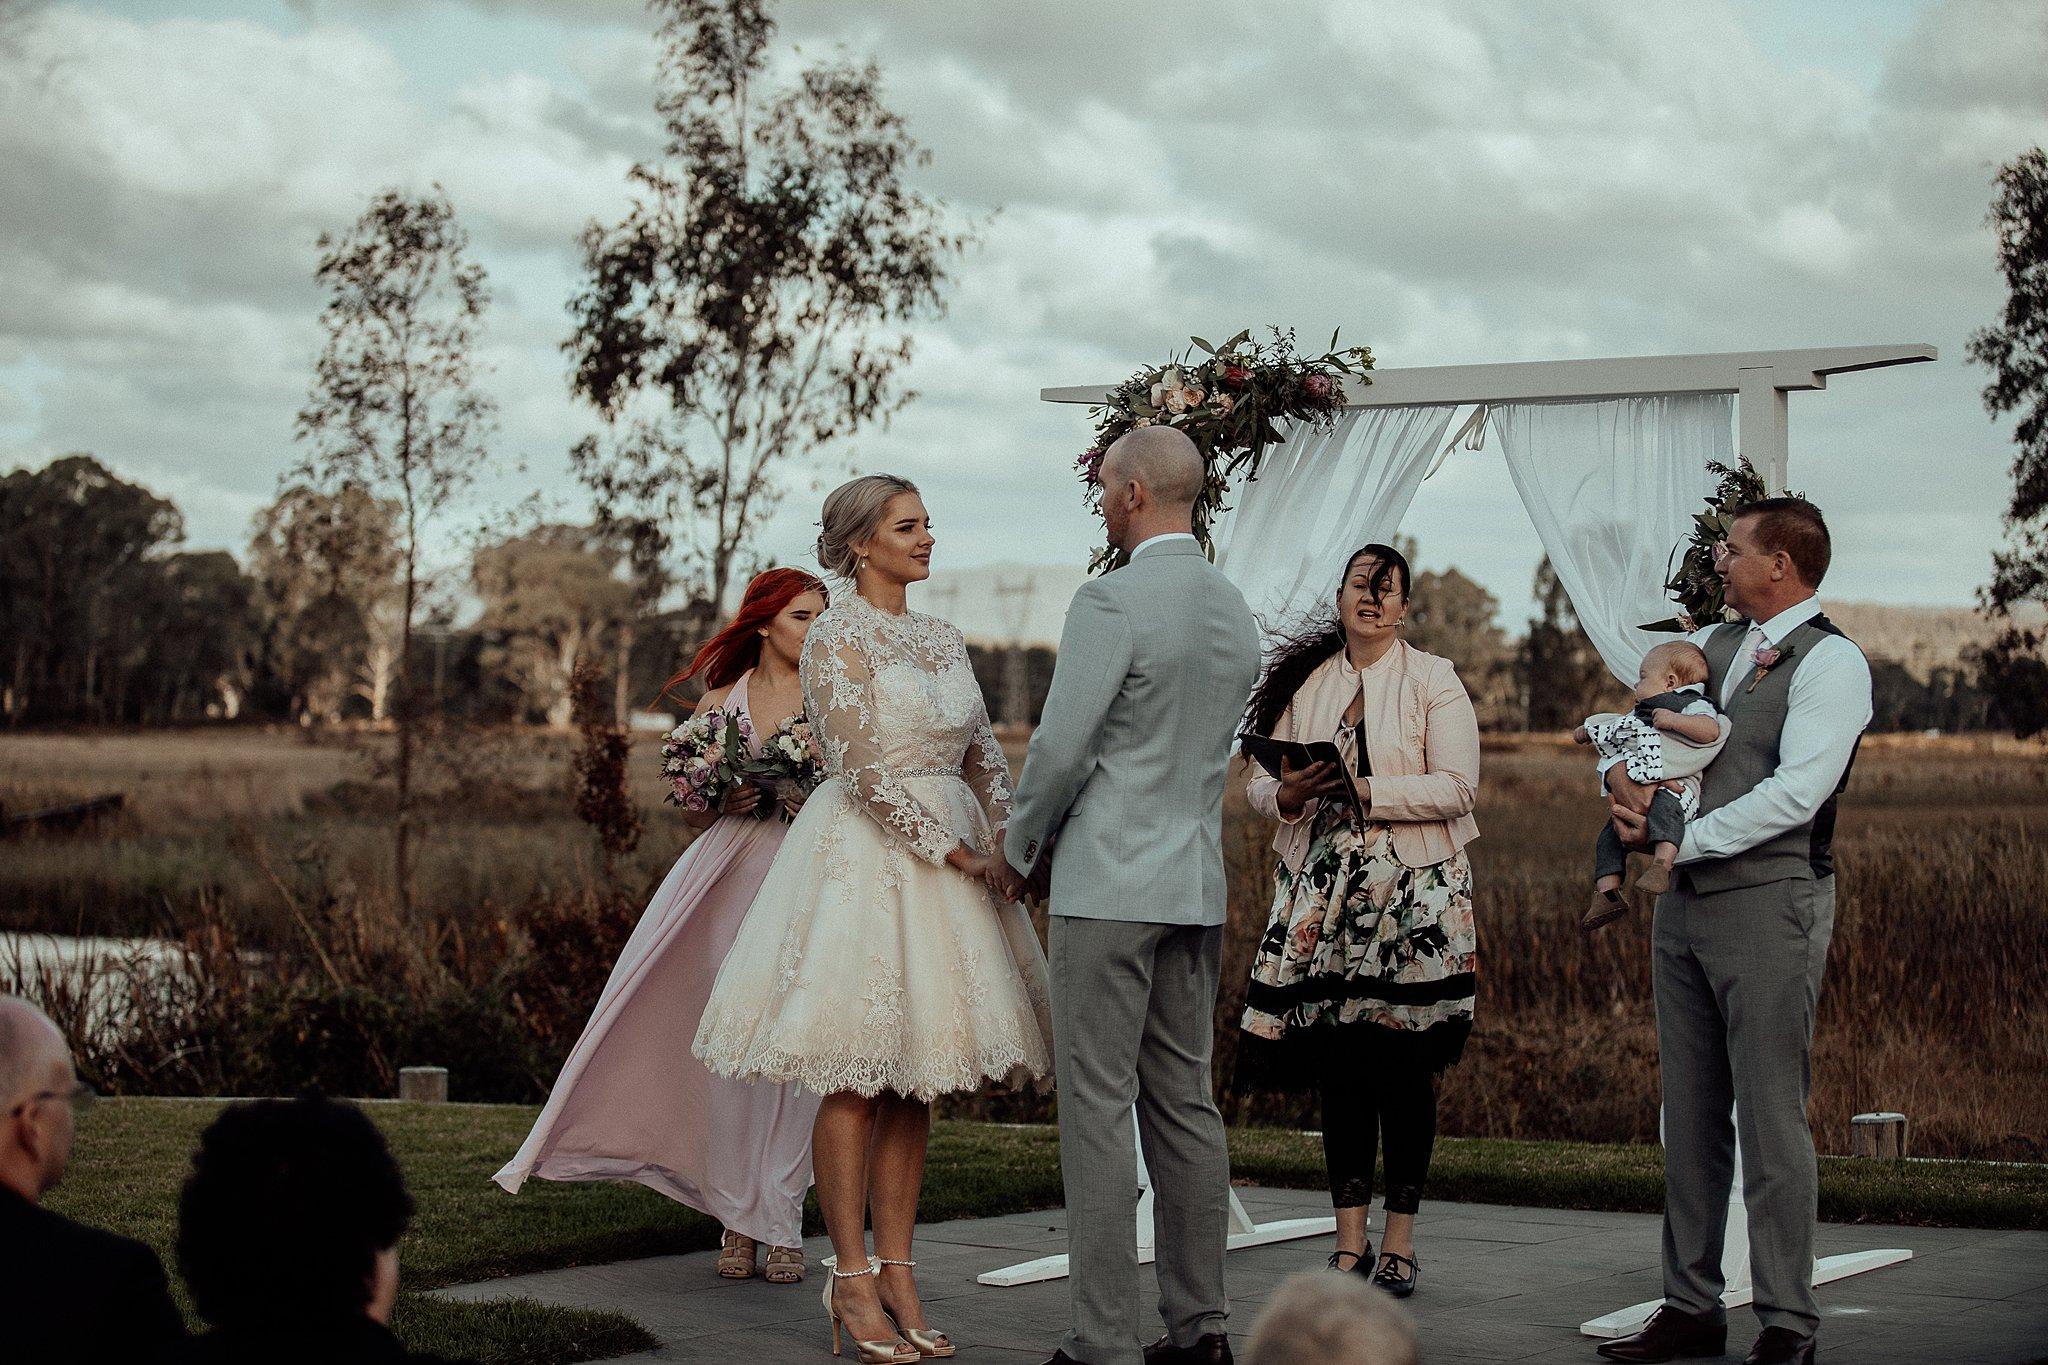 mickalathomas_puremacphotography_weddingphotographer_couplephotographer_Sheppartonphotographer_3430.jpg